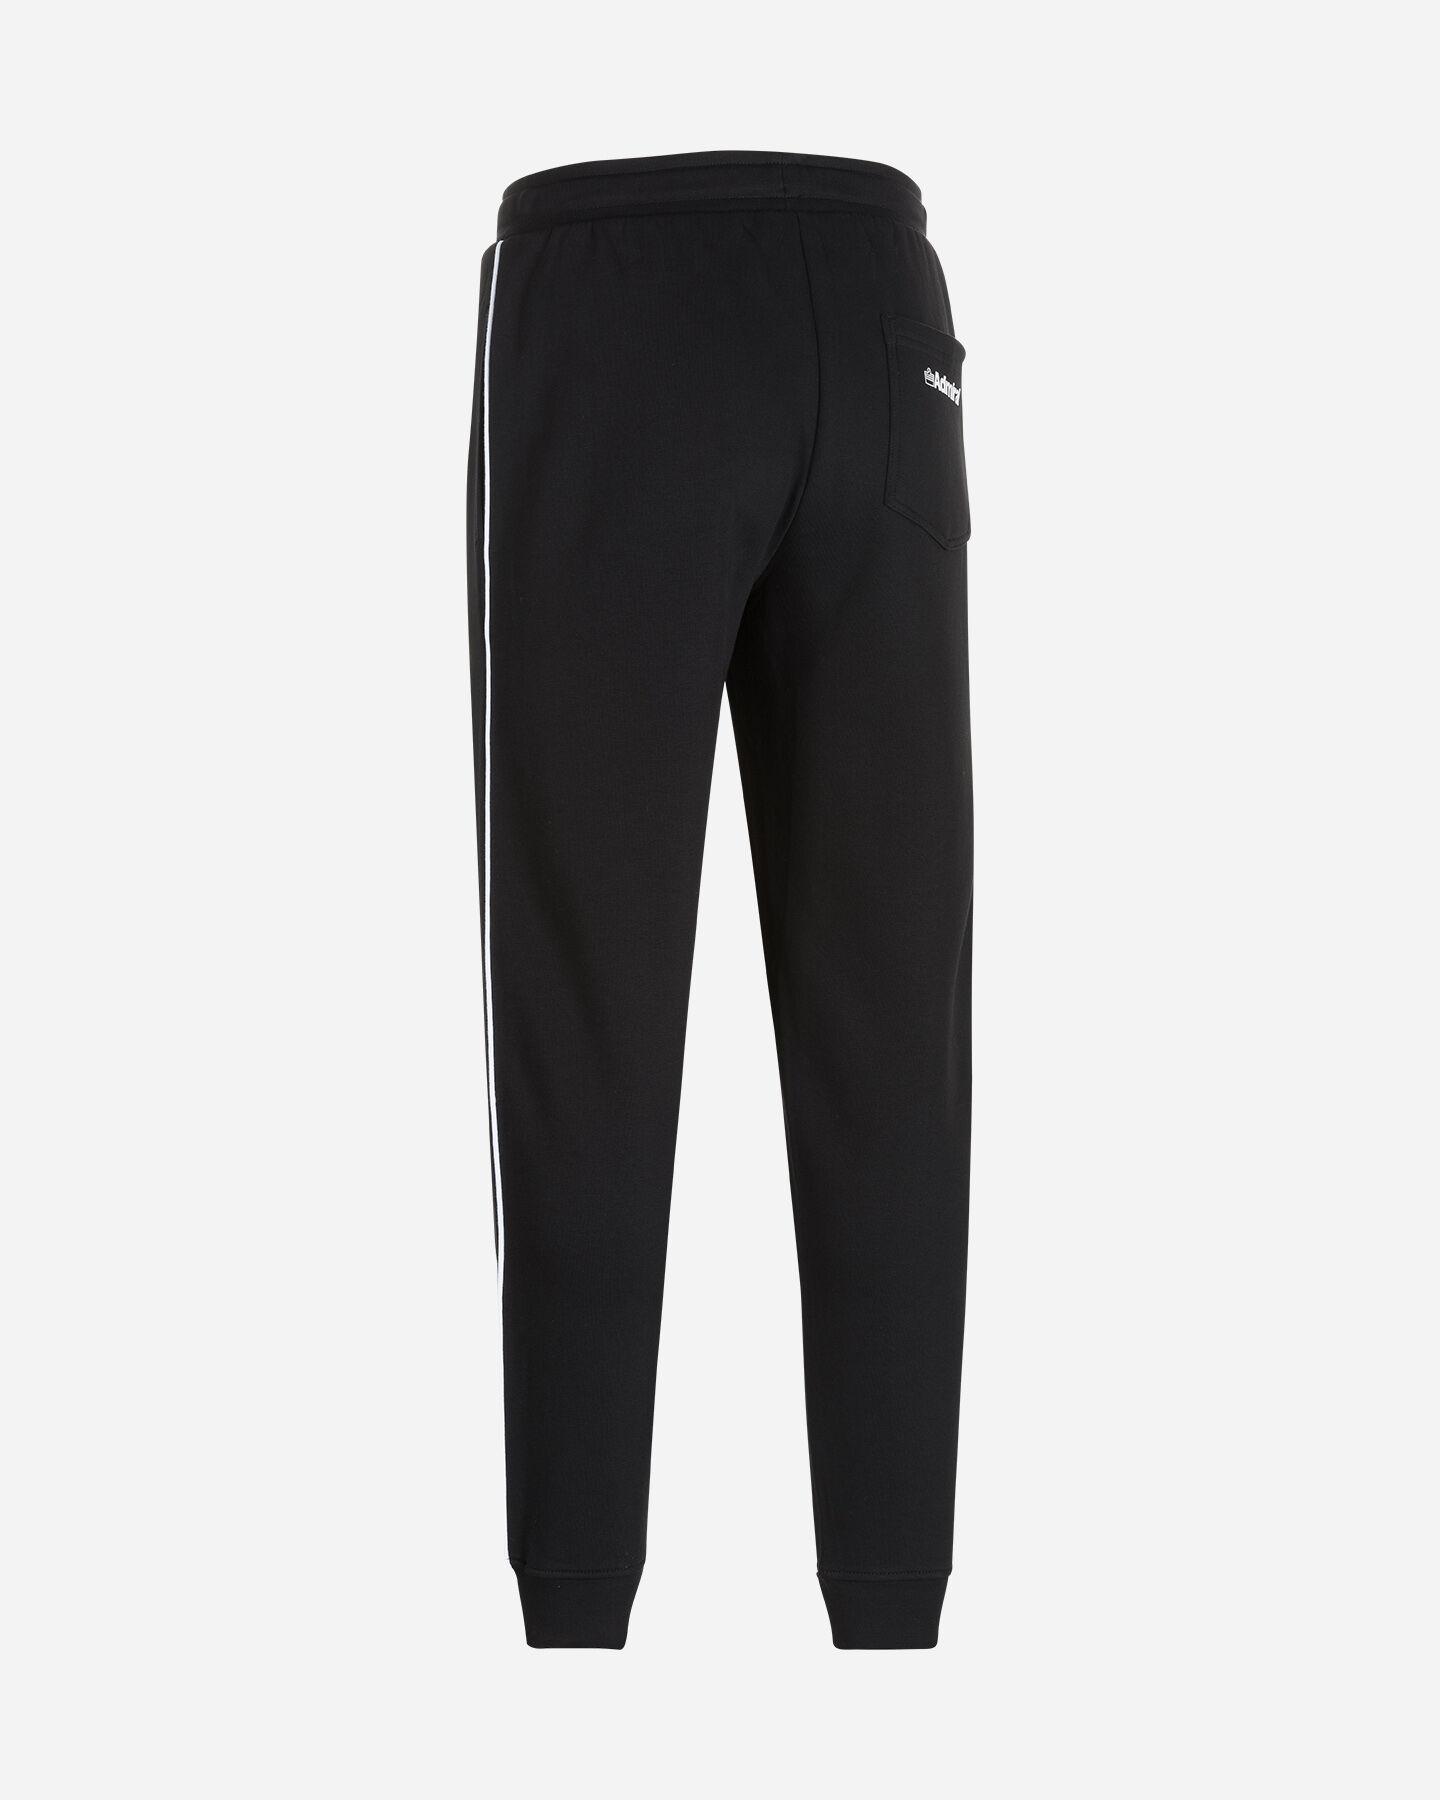 Pantalone ADMIRAL PIPING M S4080597 scatto 1